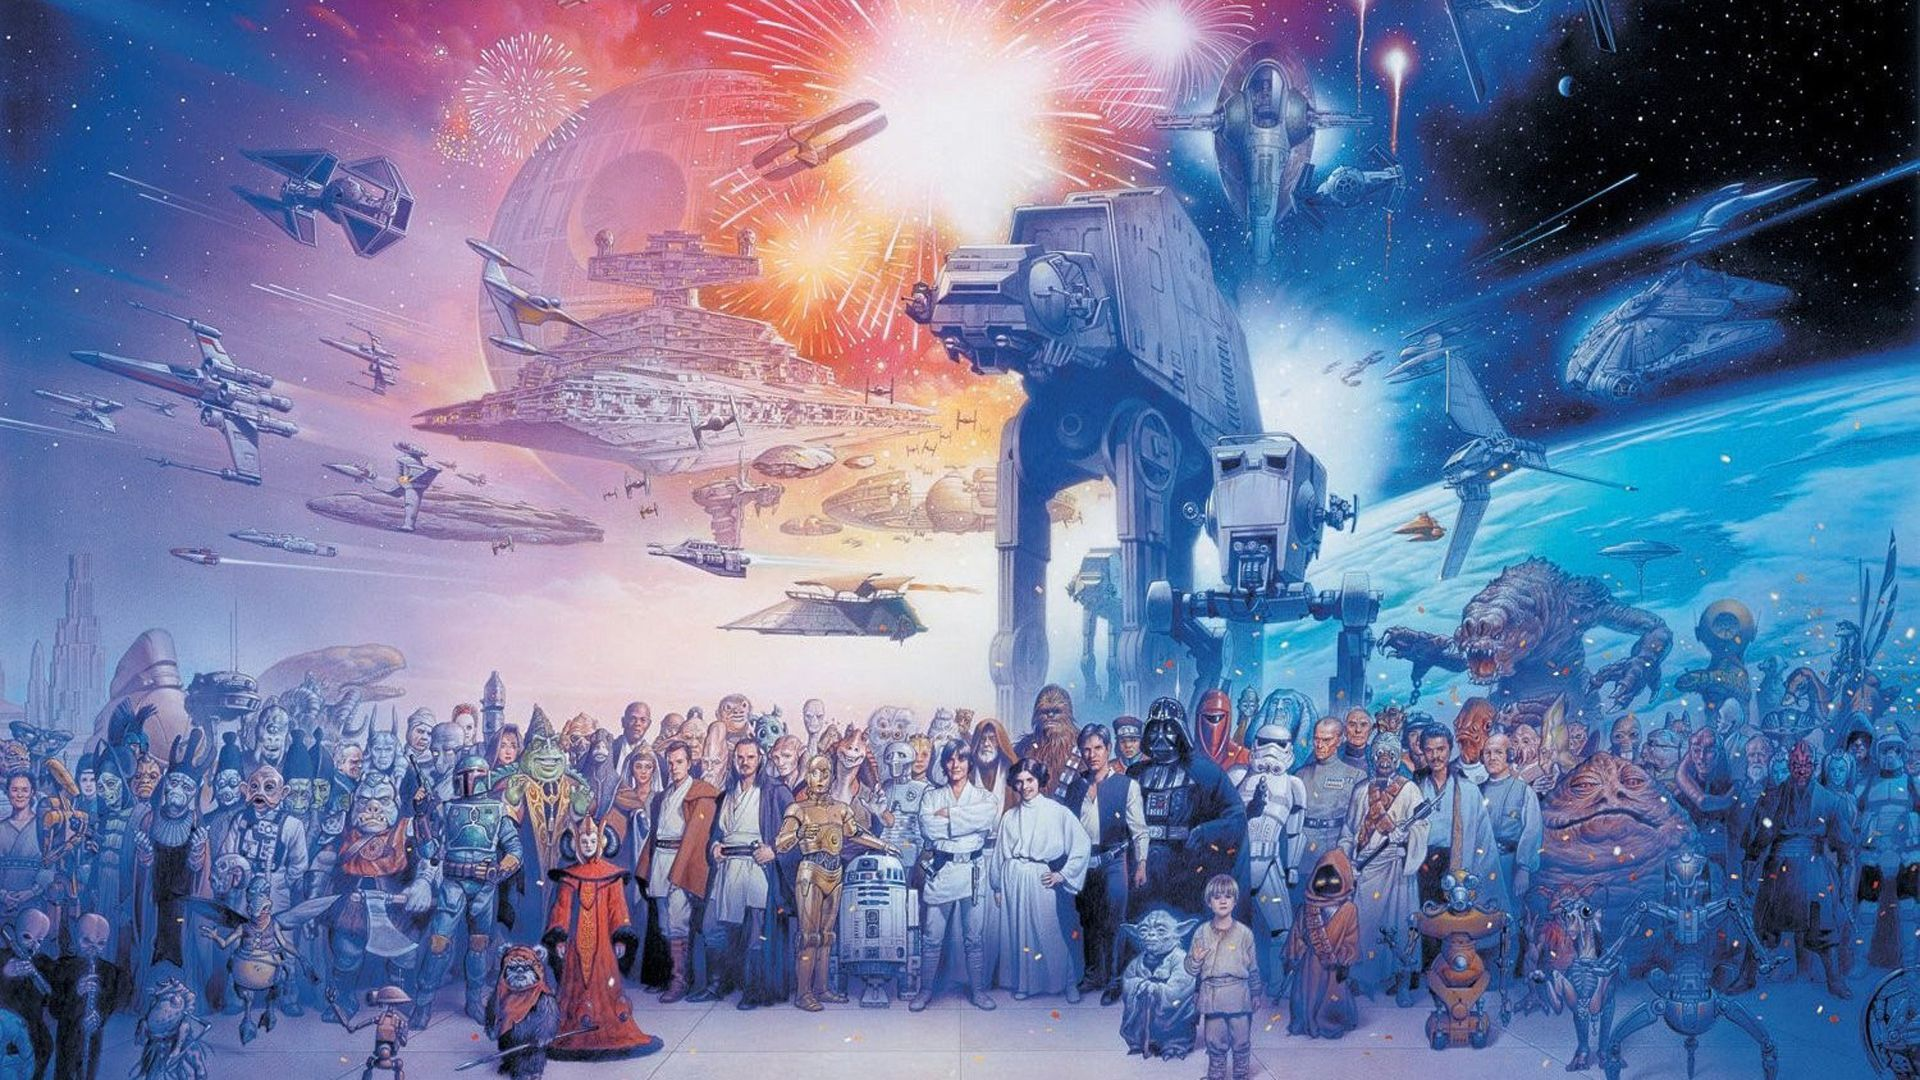 Star Wars Retro 1920x1080 Wallpapers Wallpaper Cave